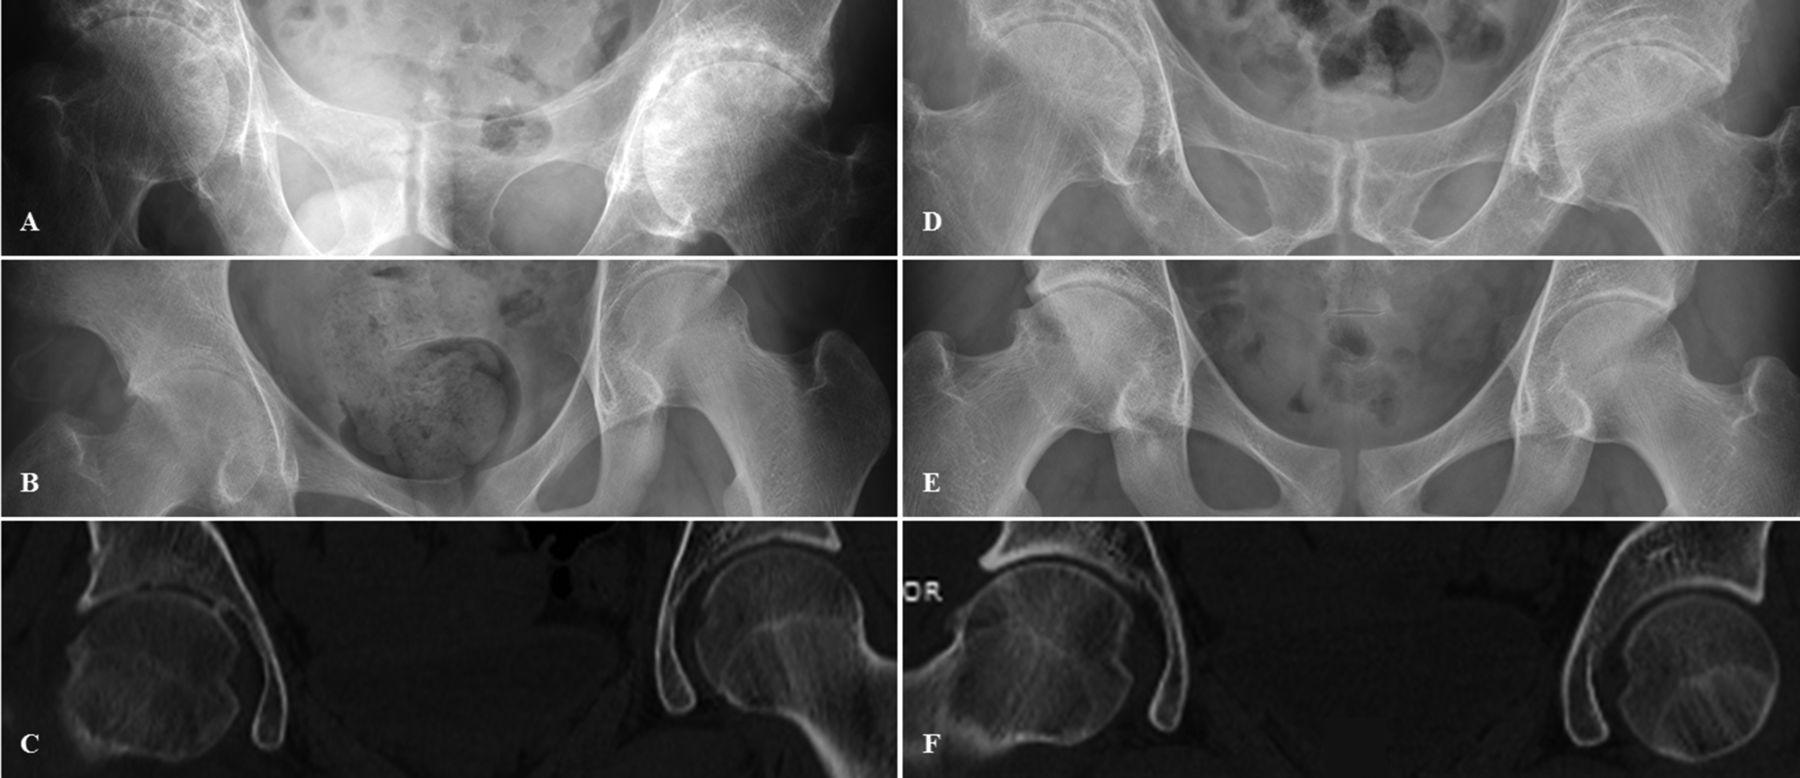 plaquenil retinopathy on oct